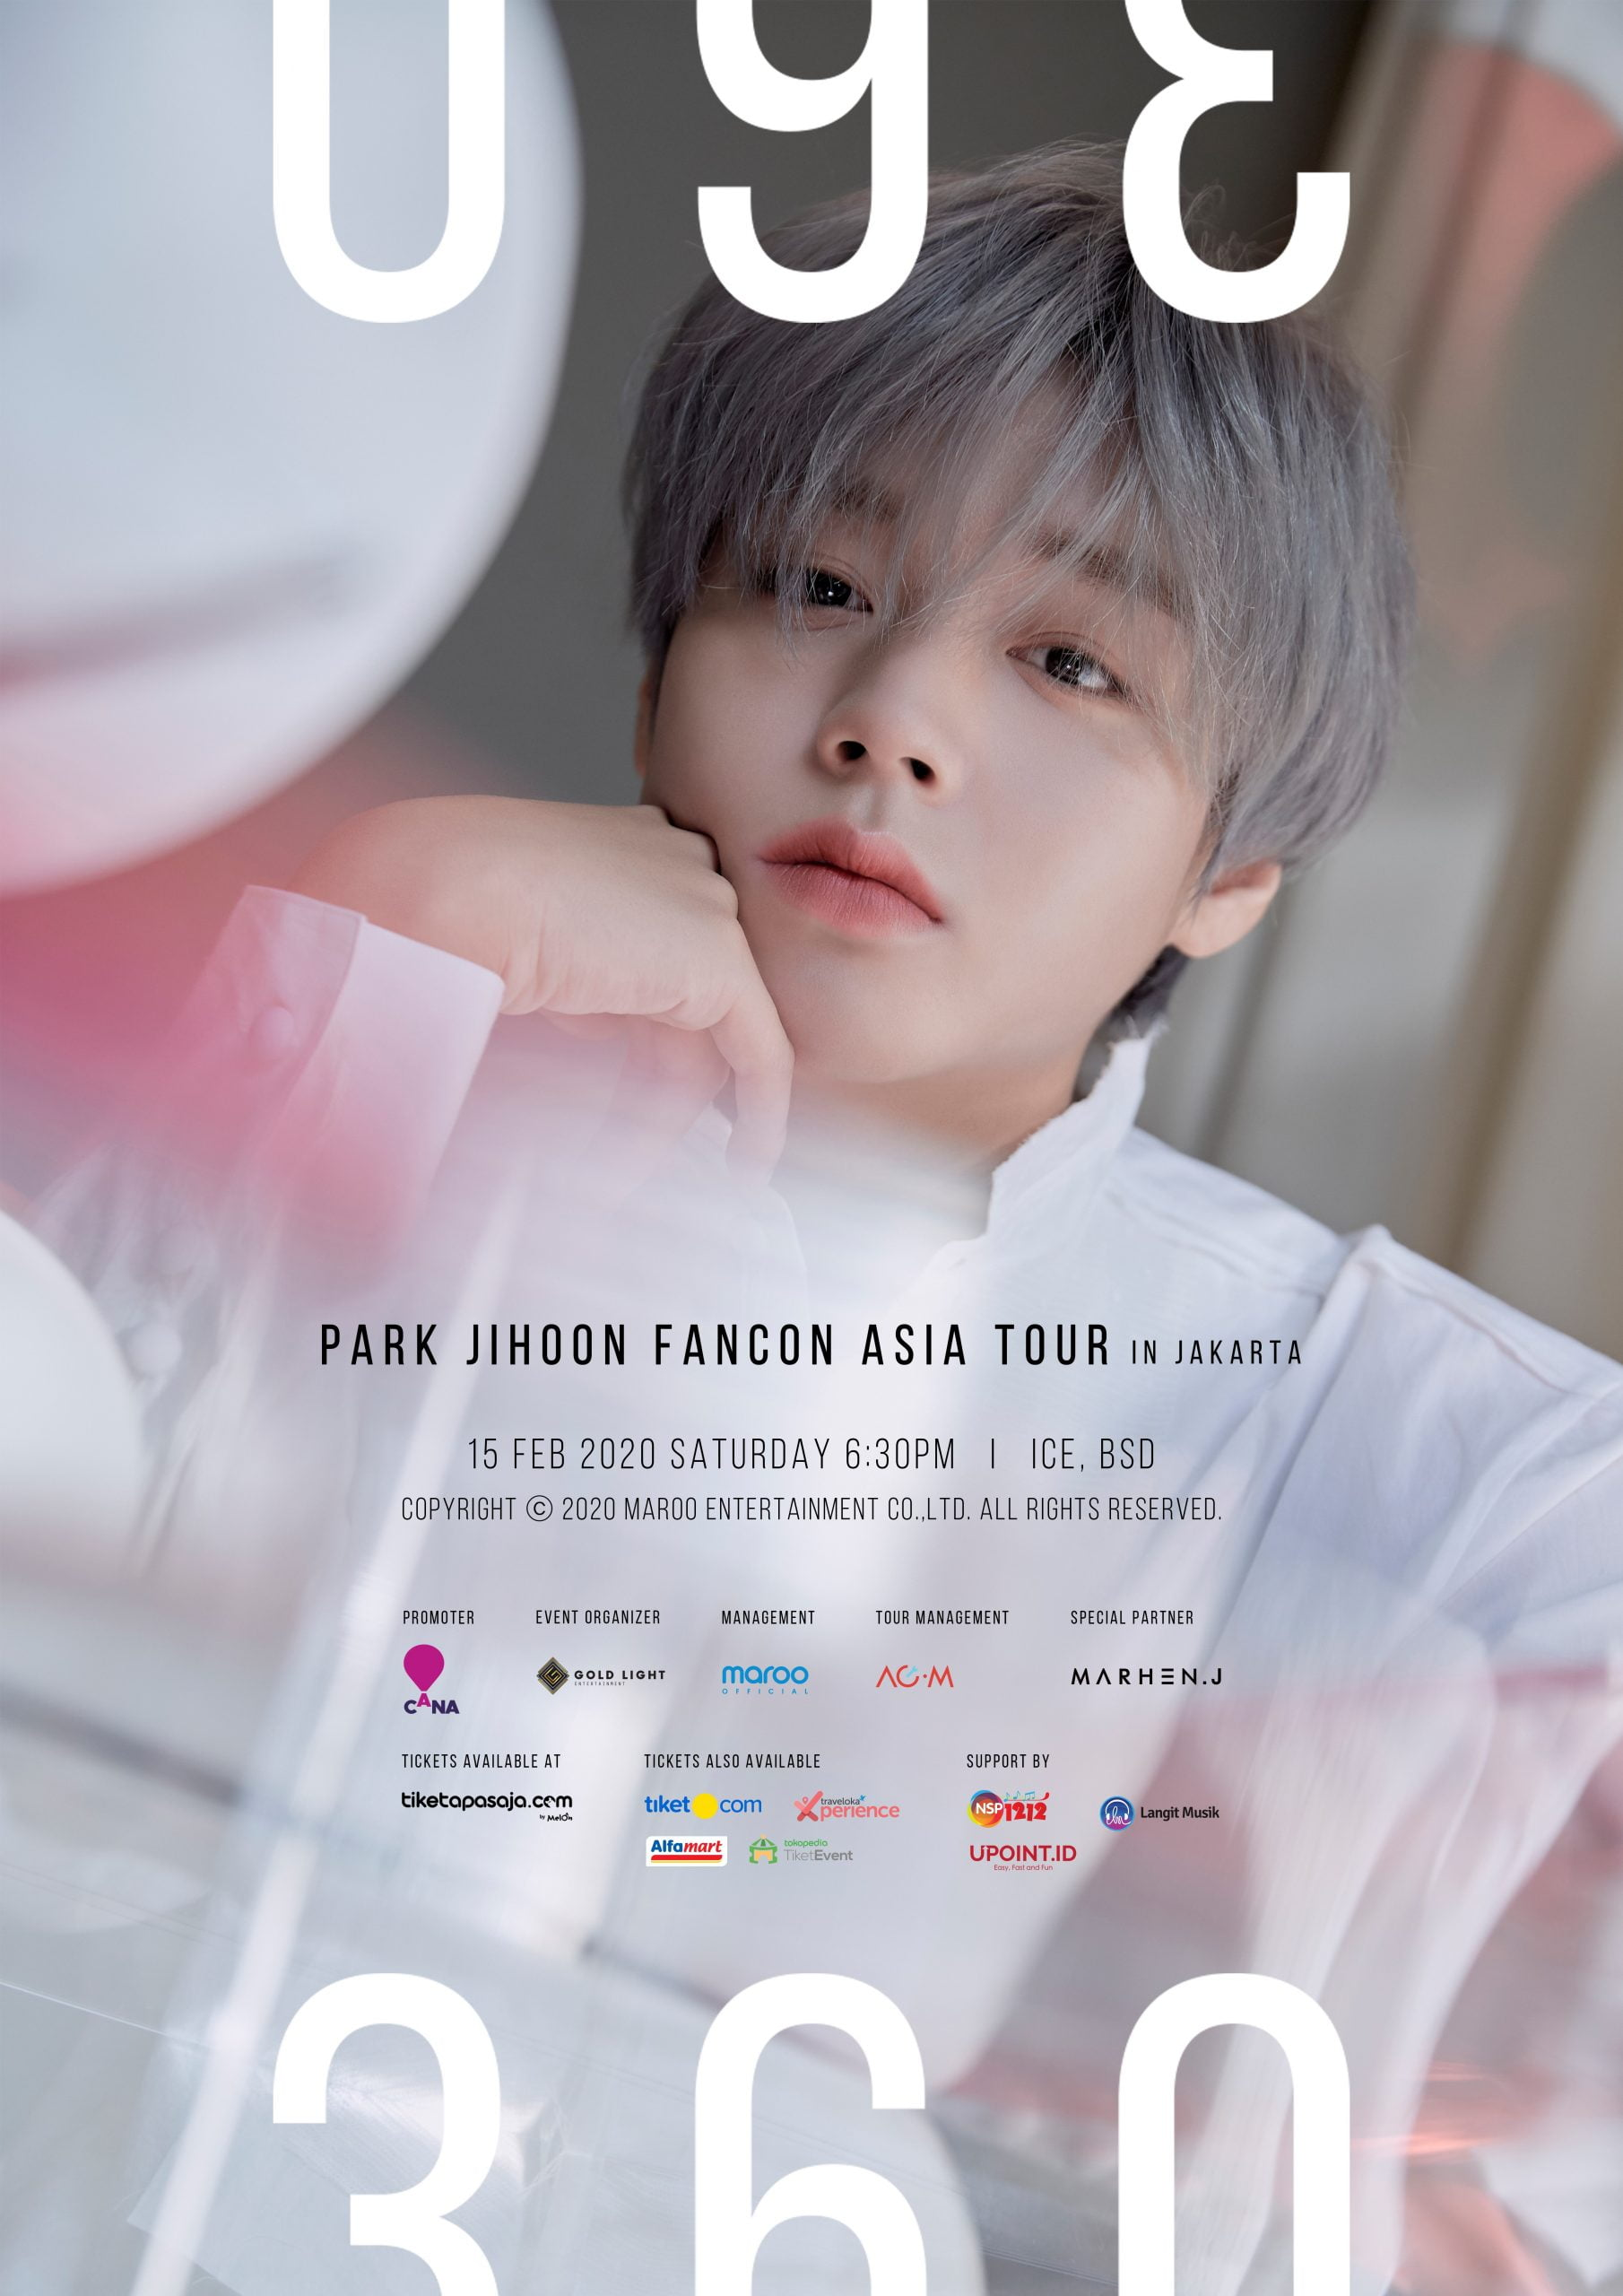 Park Jihoon